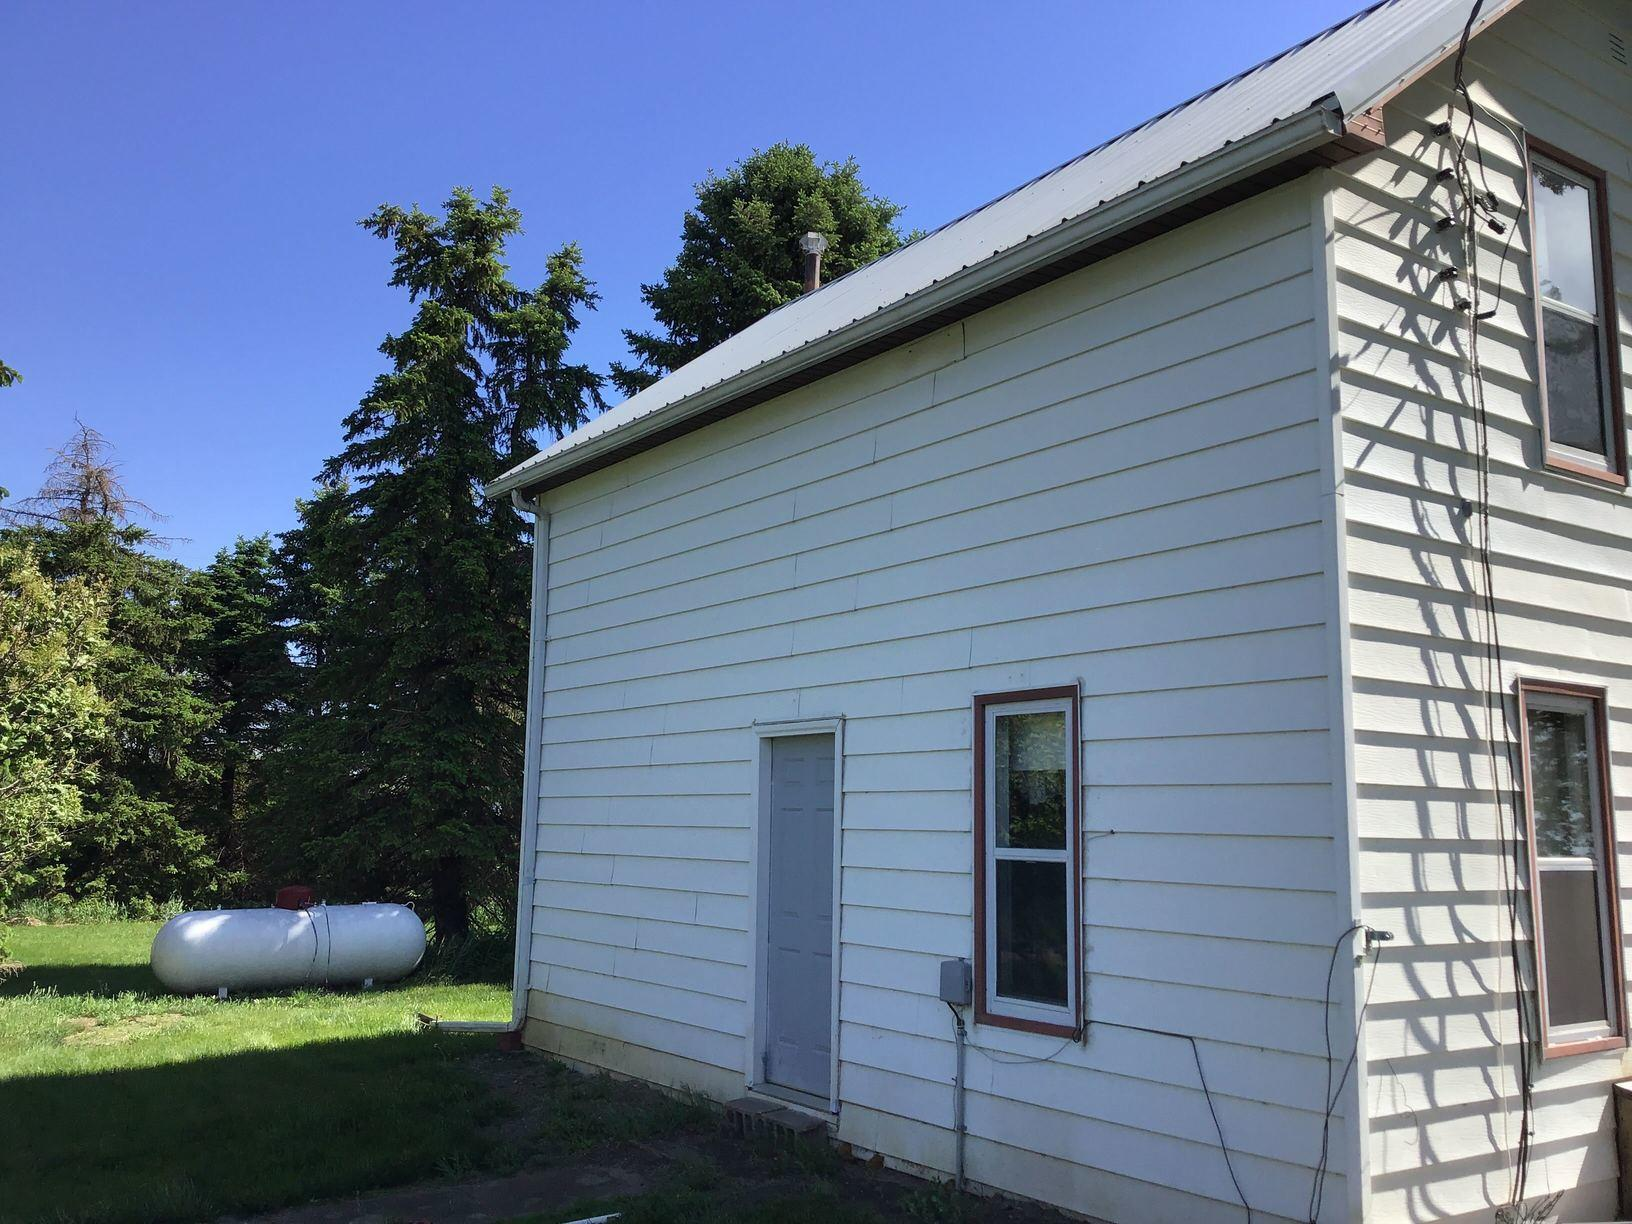 LeafGuard® Gutters - 46483 275th St. Lennox South Dakota 57039 - Before Photo